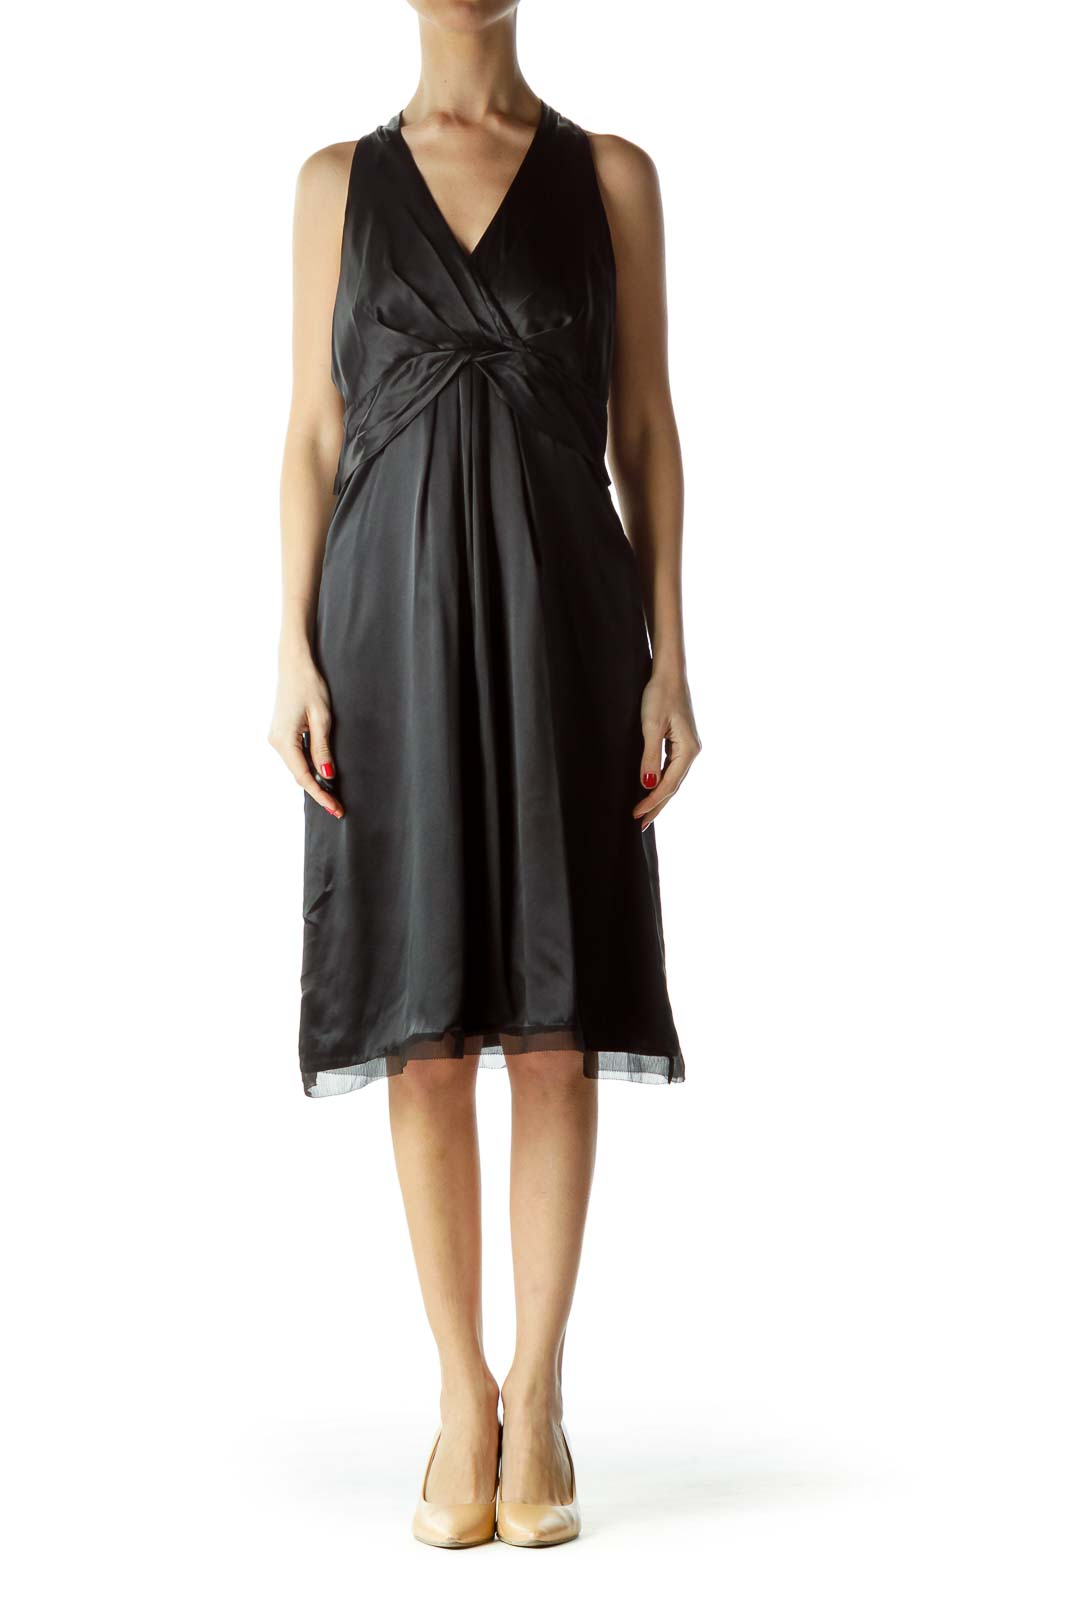 Black Halter Neck Pleated Front Cocktail Dress